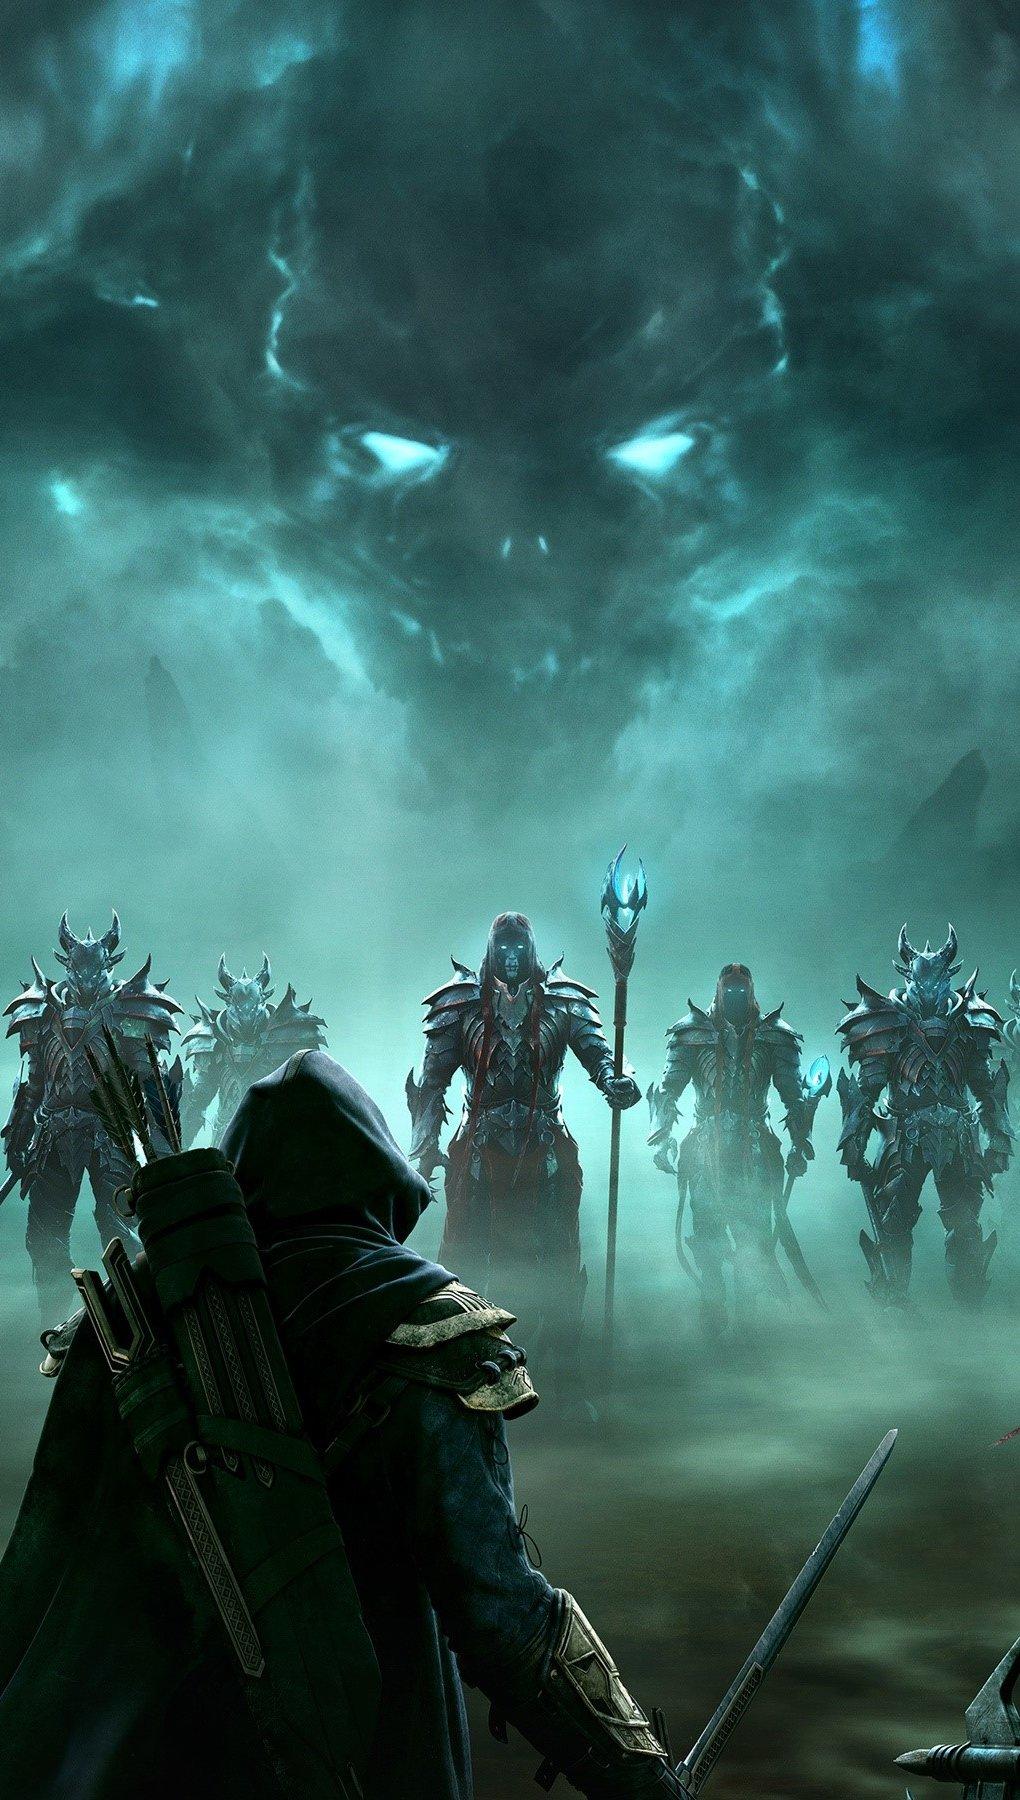 Fondos de pantalla The Elder Scrolls en linea Vertical